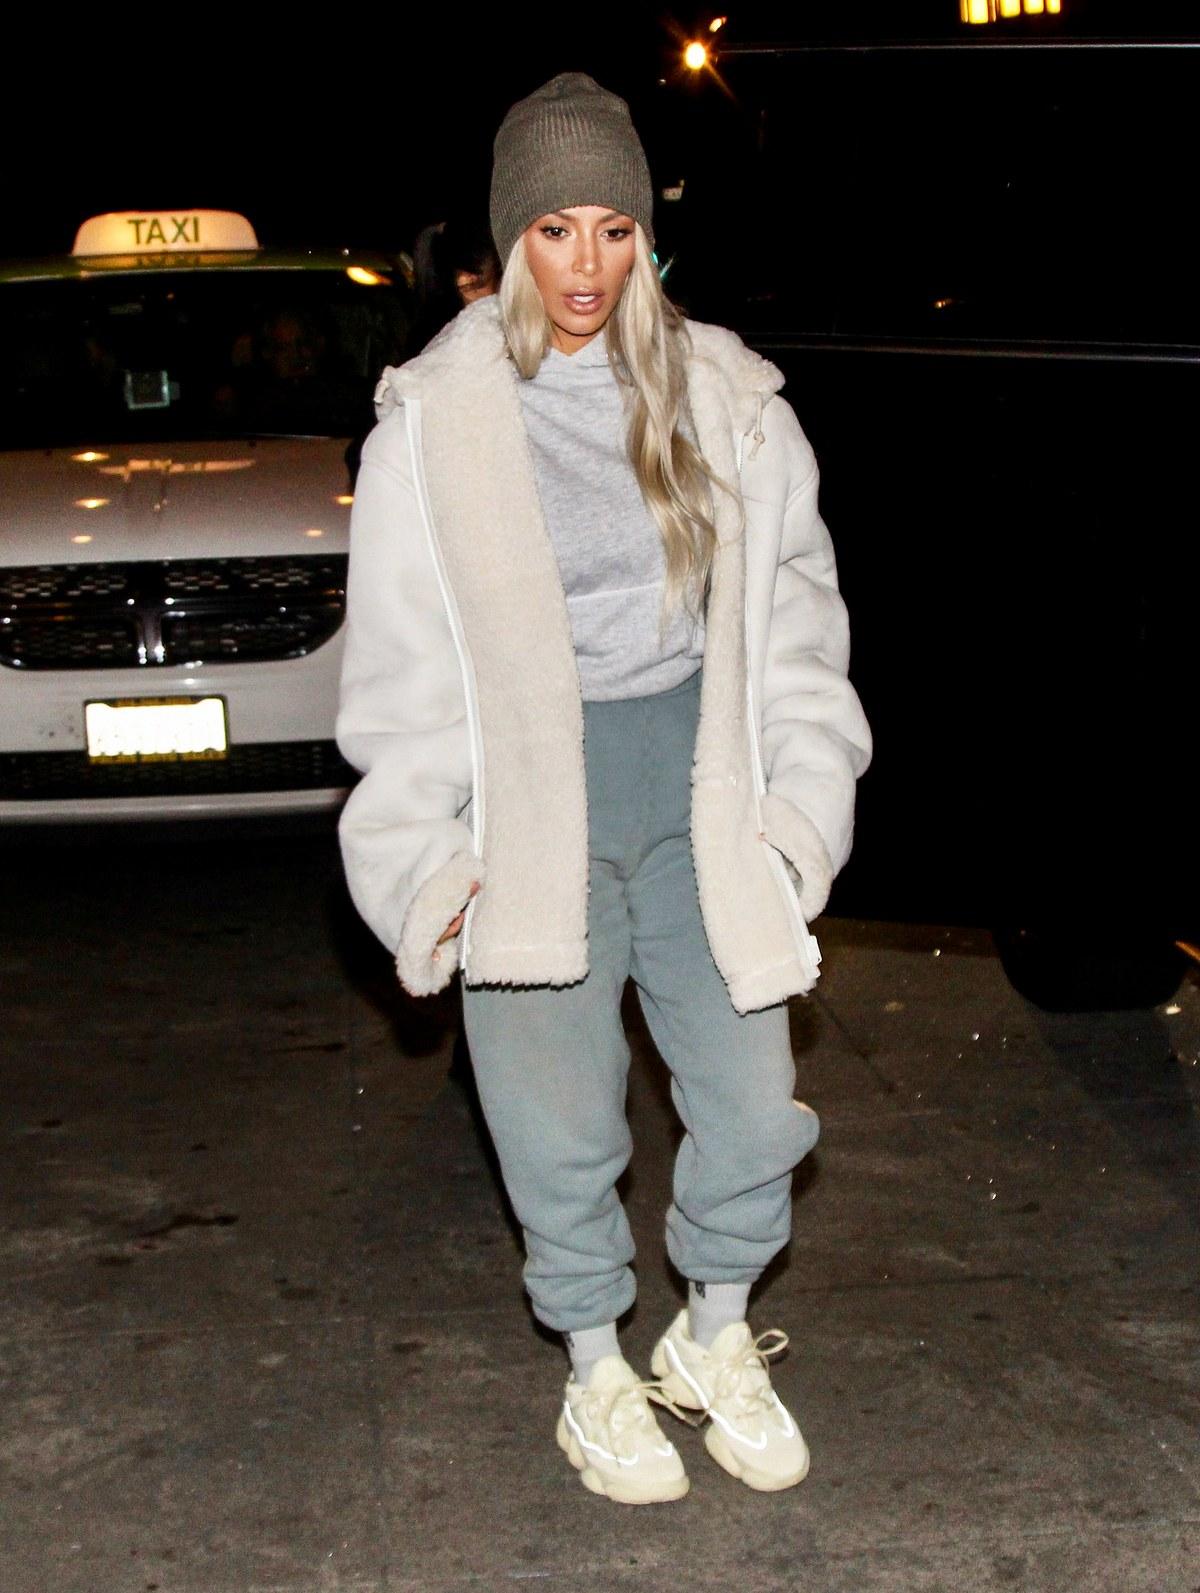 Kim Kardashian in the Yeezy Sneakers